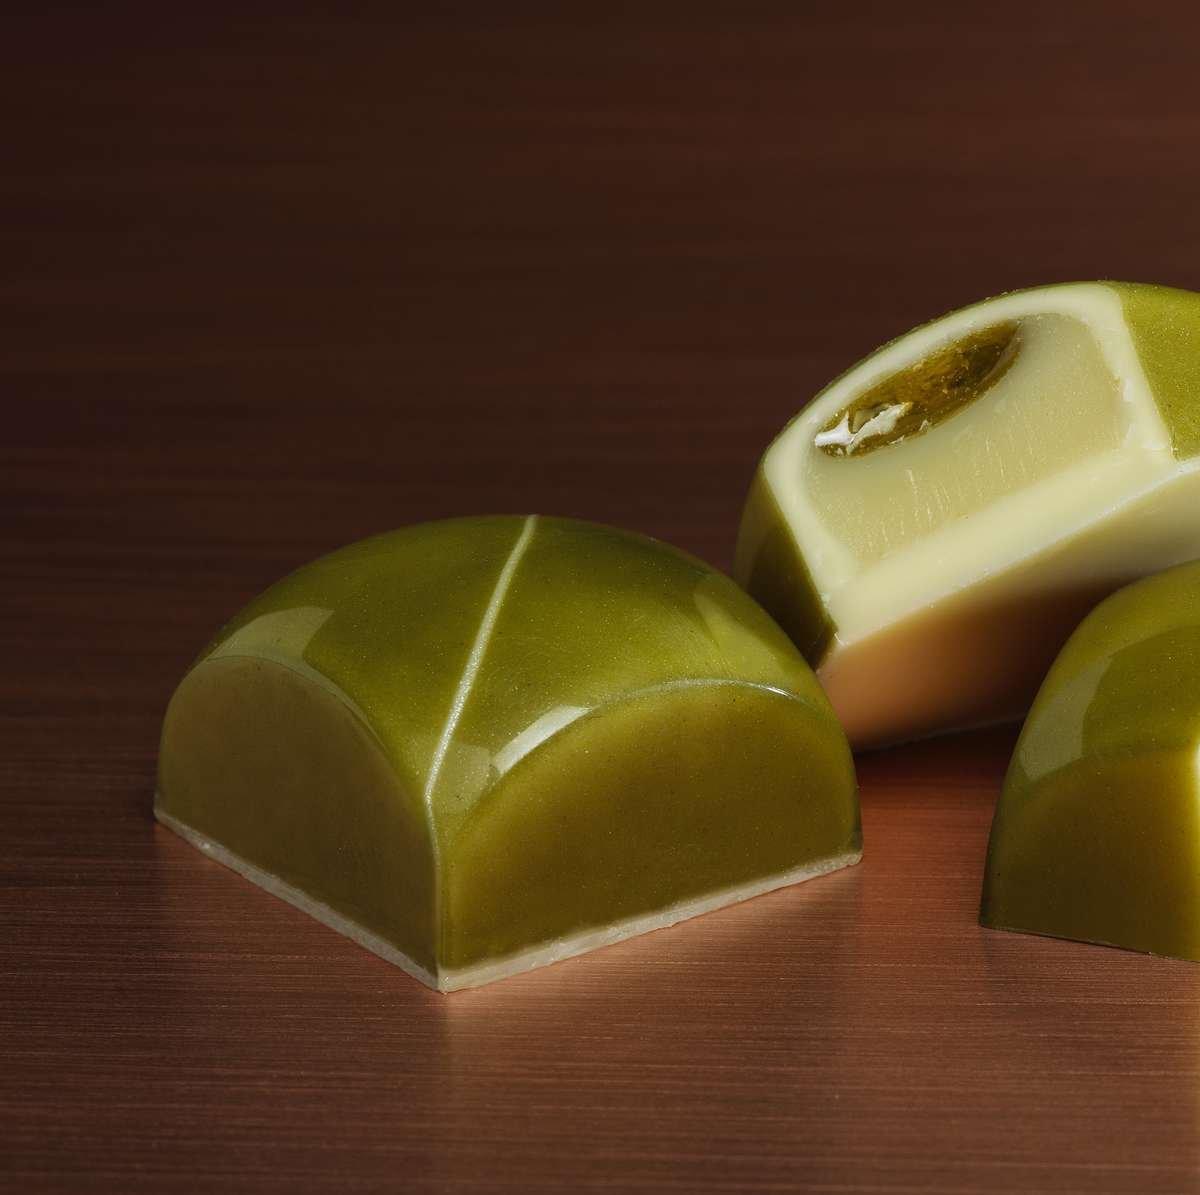 MasterClass Alexandre Bourdeaux - Chocolate & Ganache Formulation 3.0